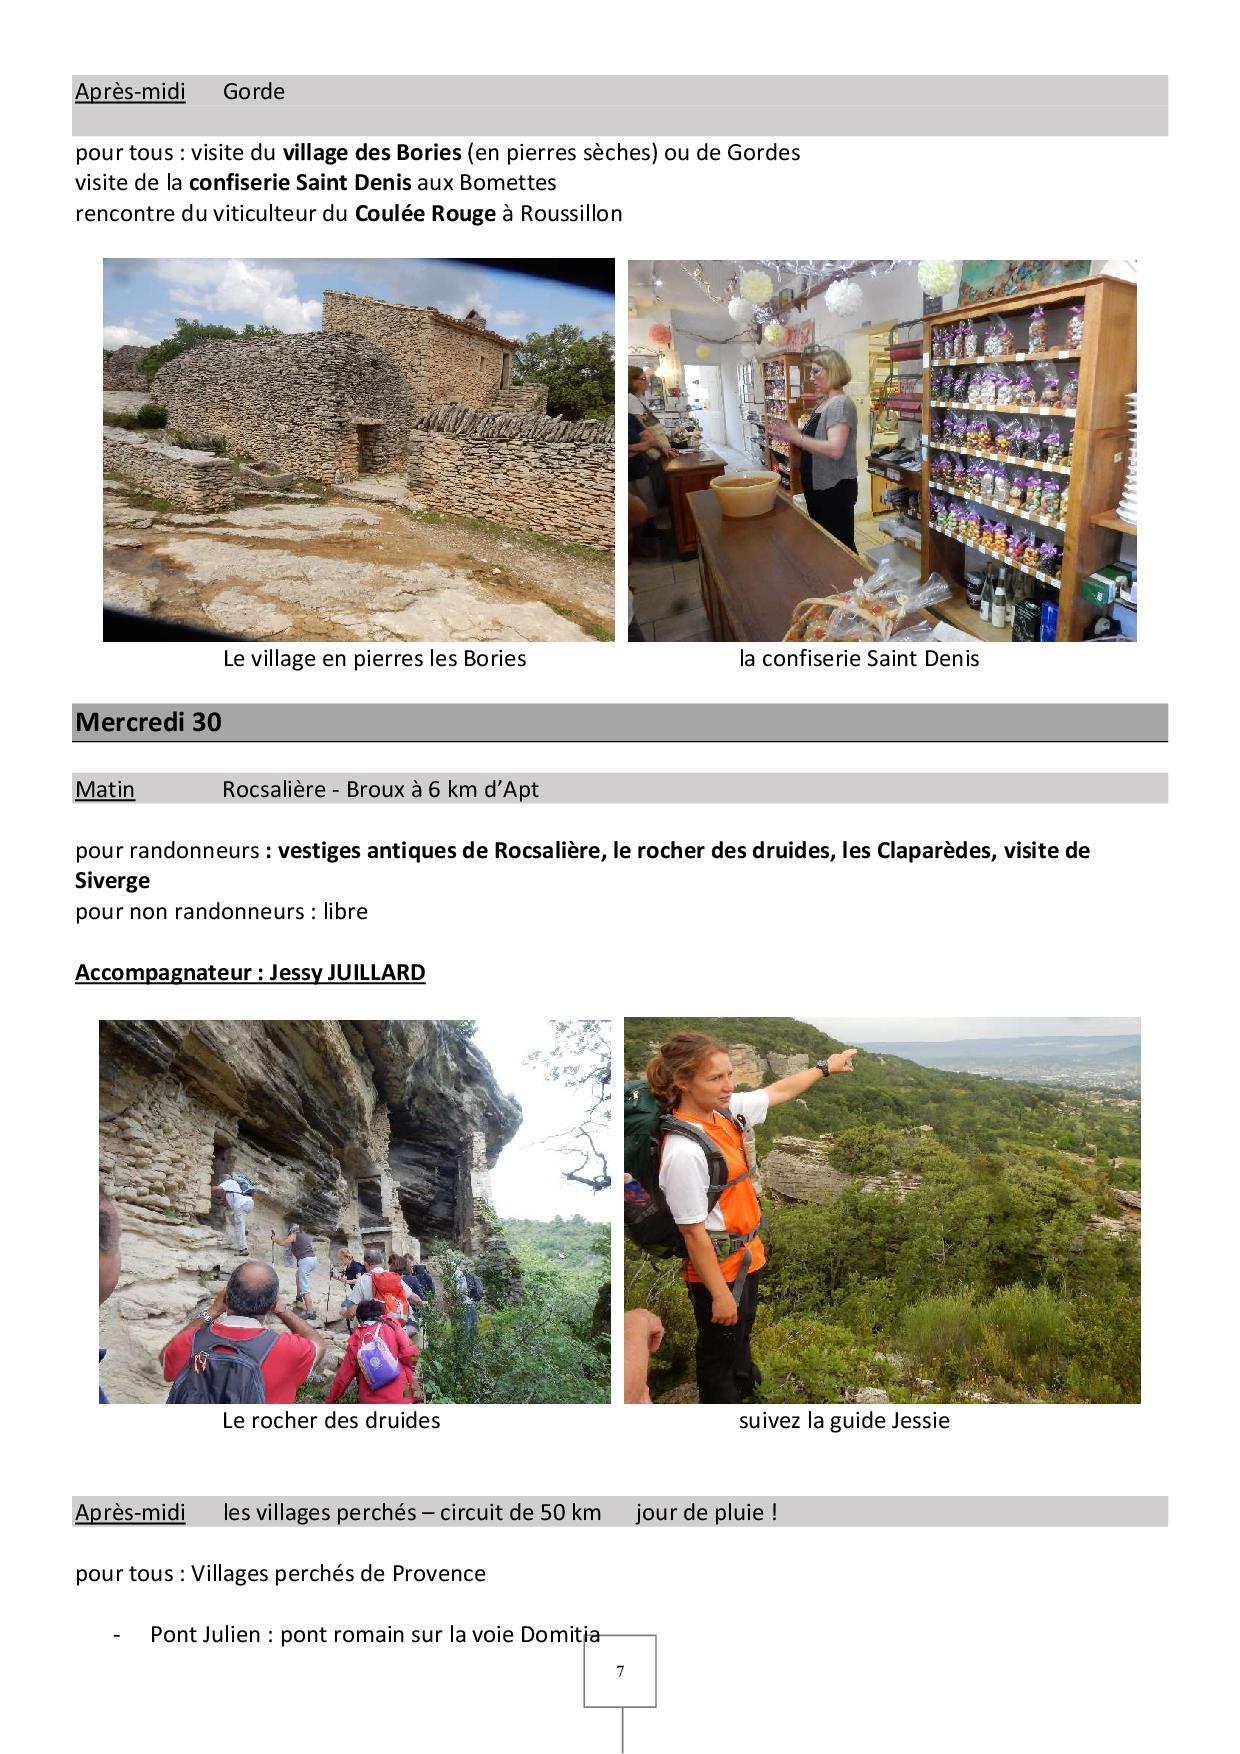 C_Users_Pierre_Documents_APT PDF - Copie07.jpg